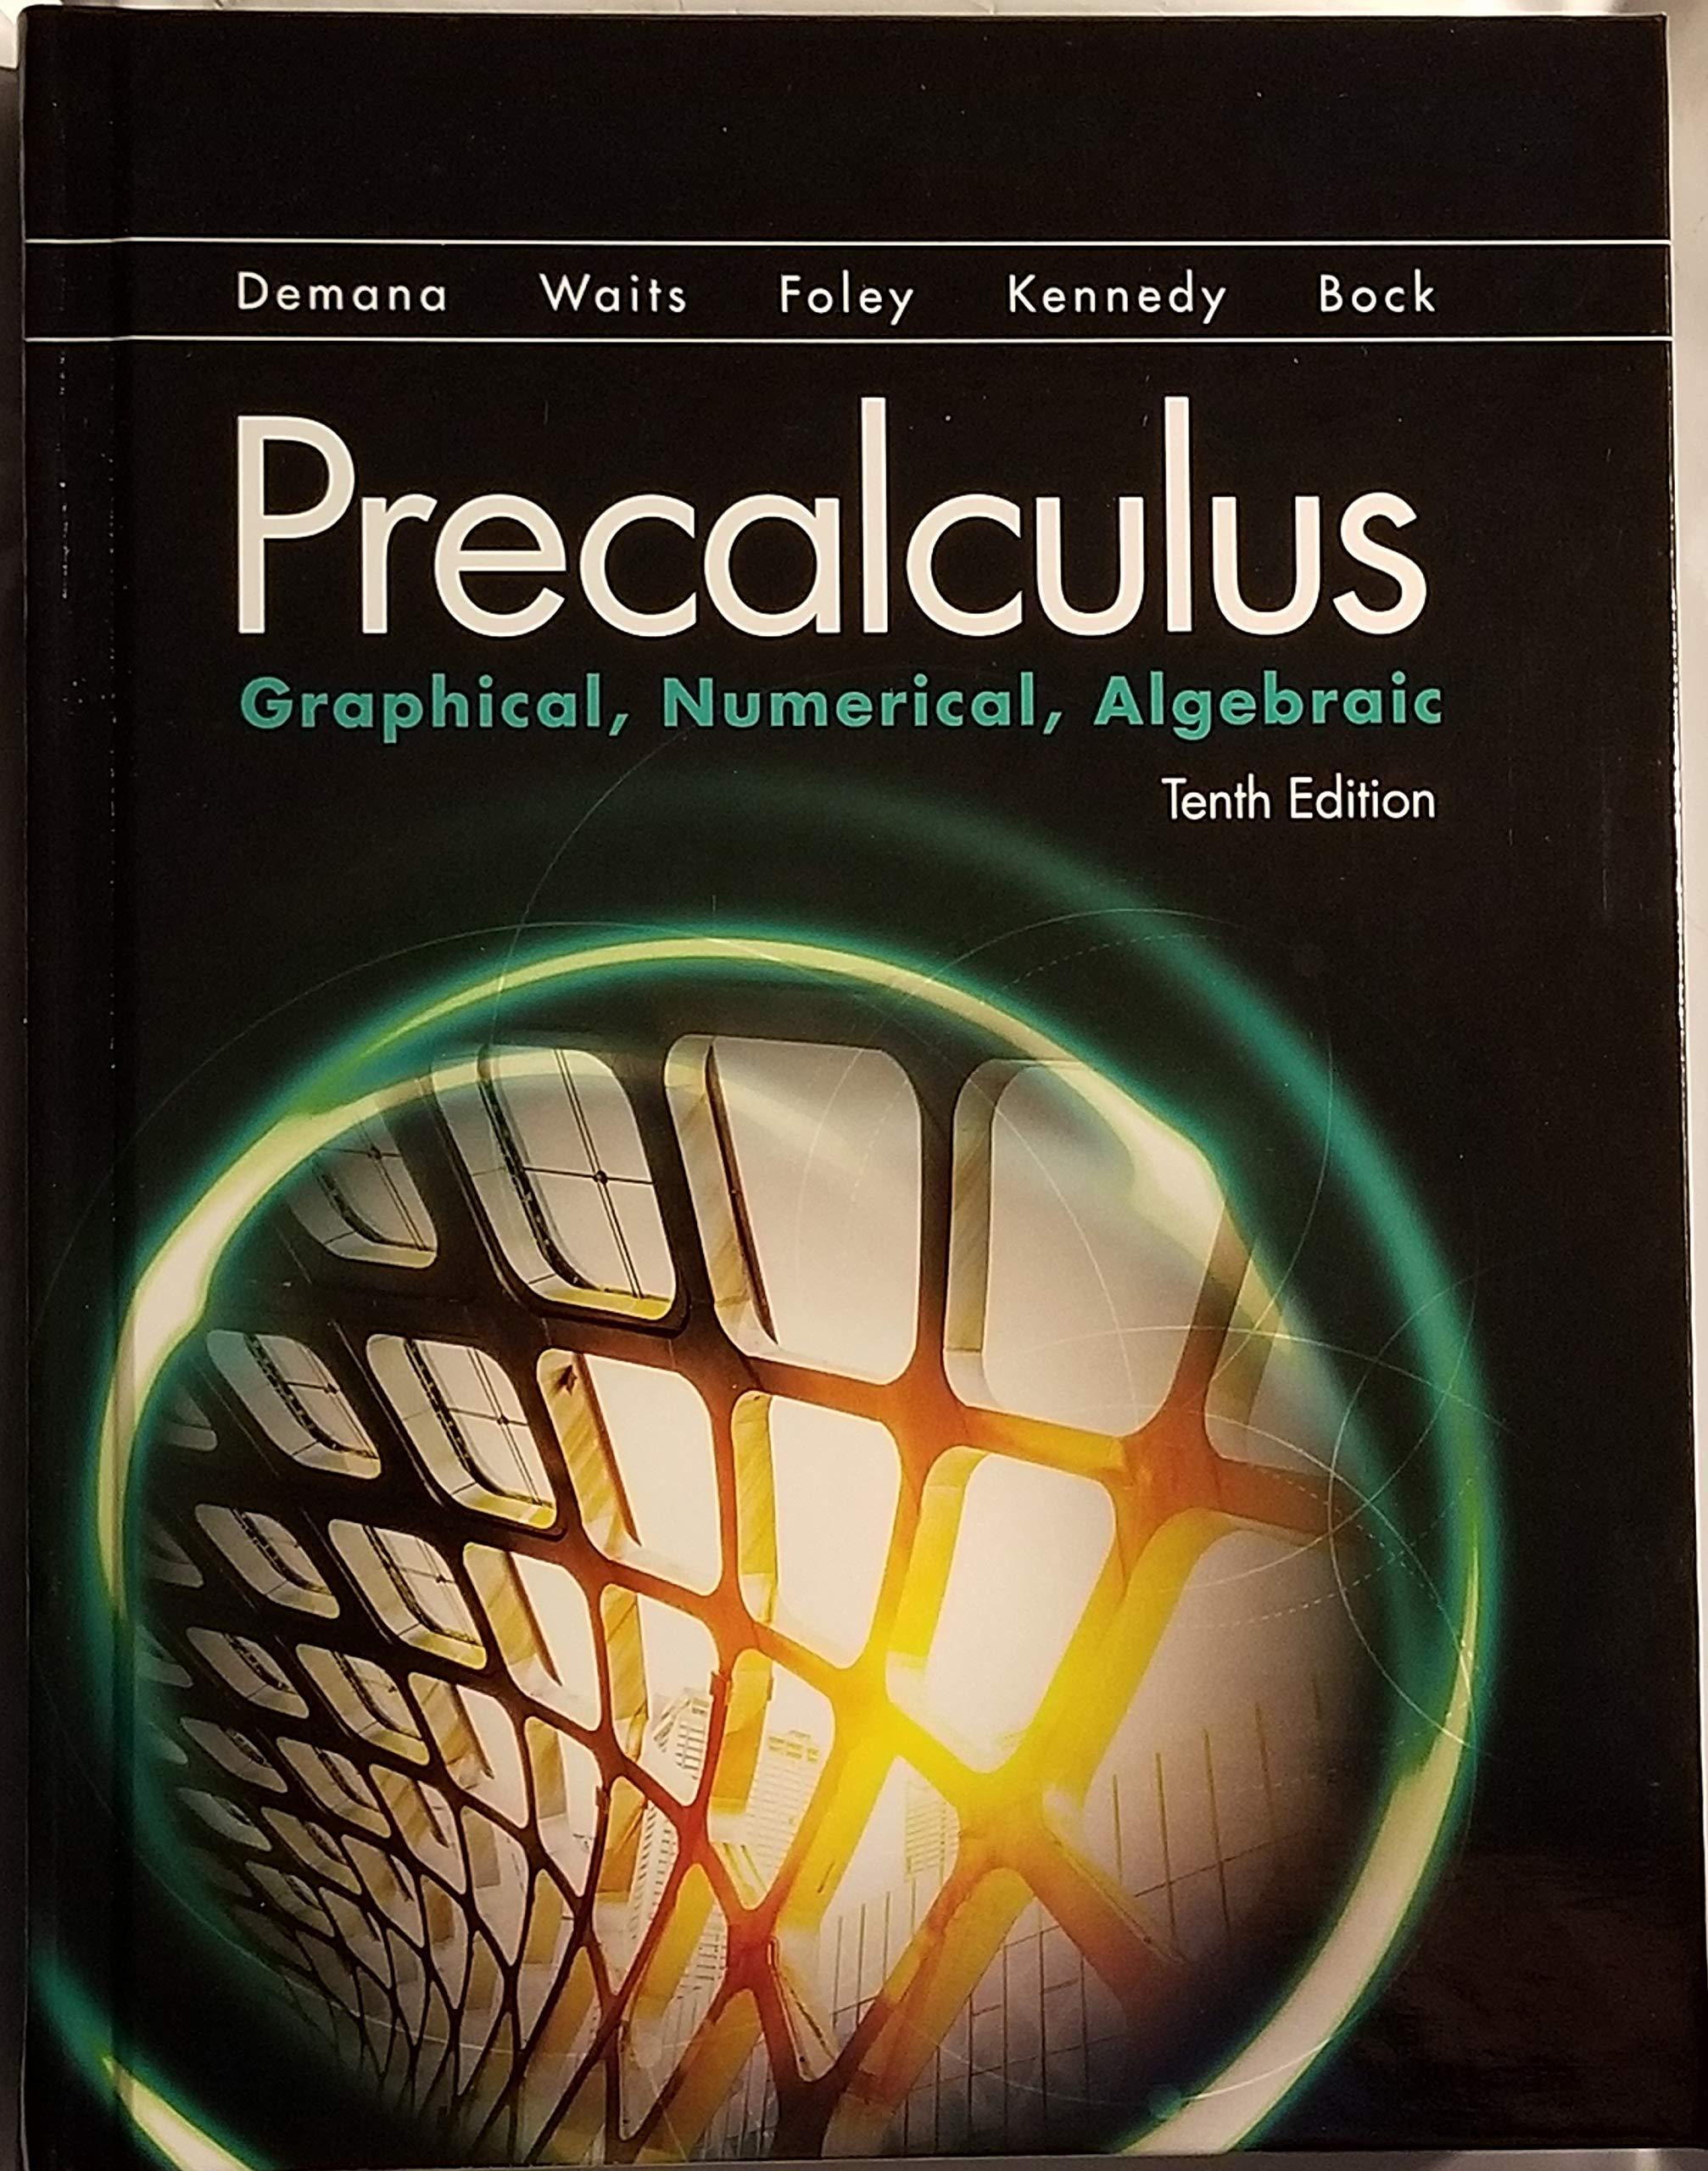 Precalculus: Graphical, Numerical, Algebraic 10th Edition